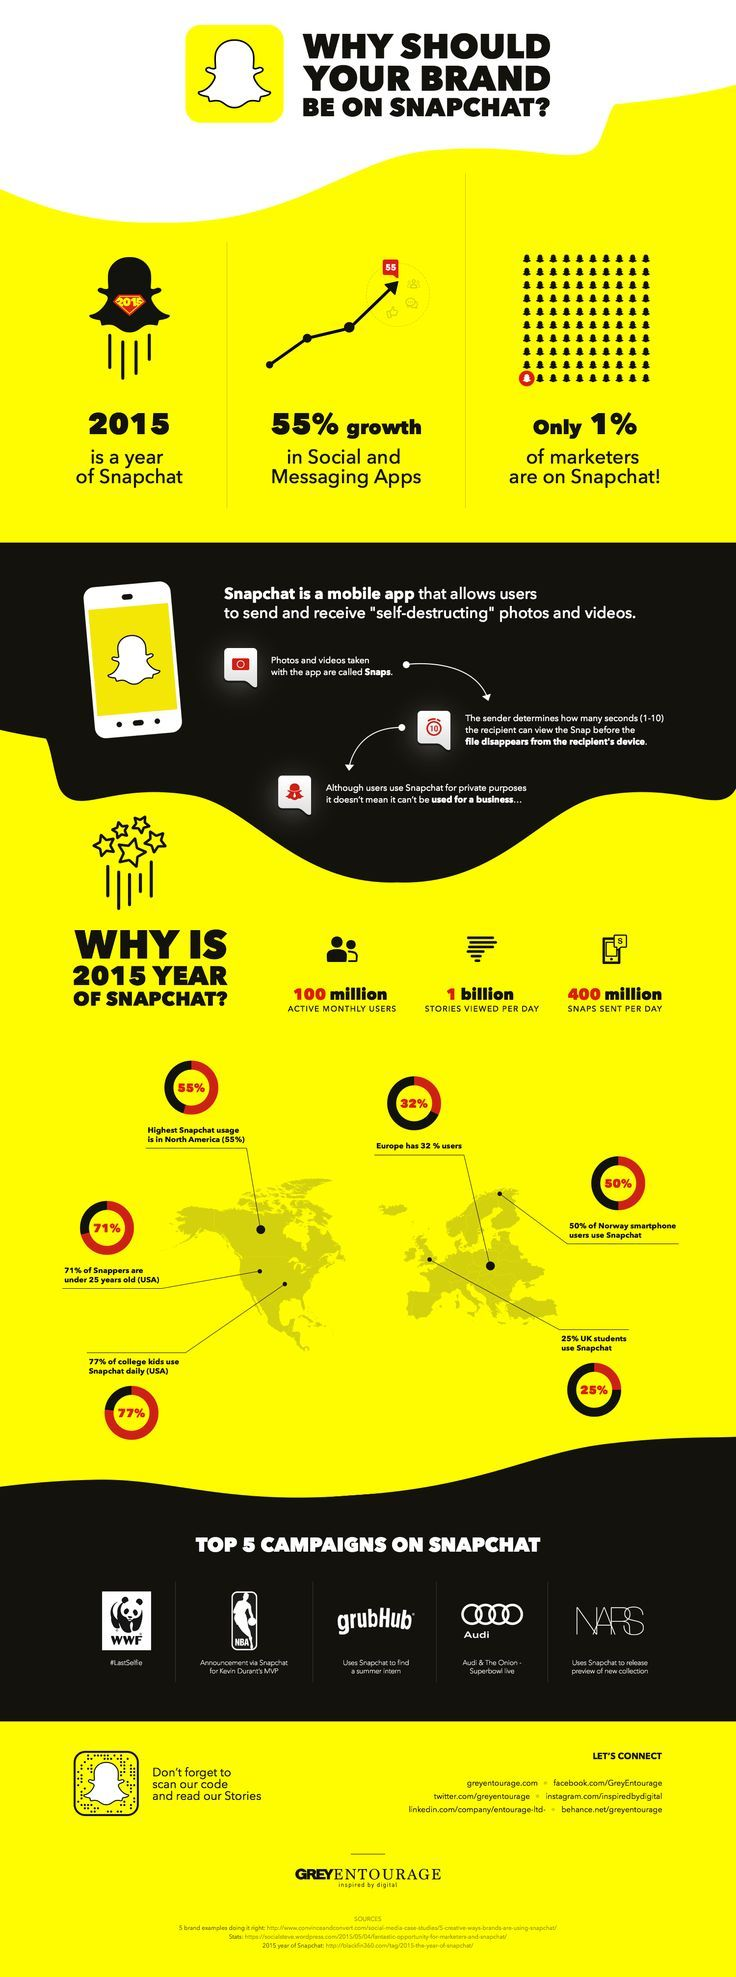 Why Should Your Brand be on Snapchat -  #Snapchat #tips #socialmedia